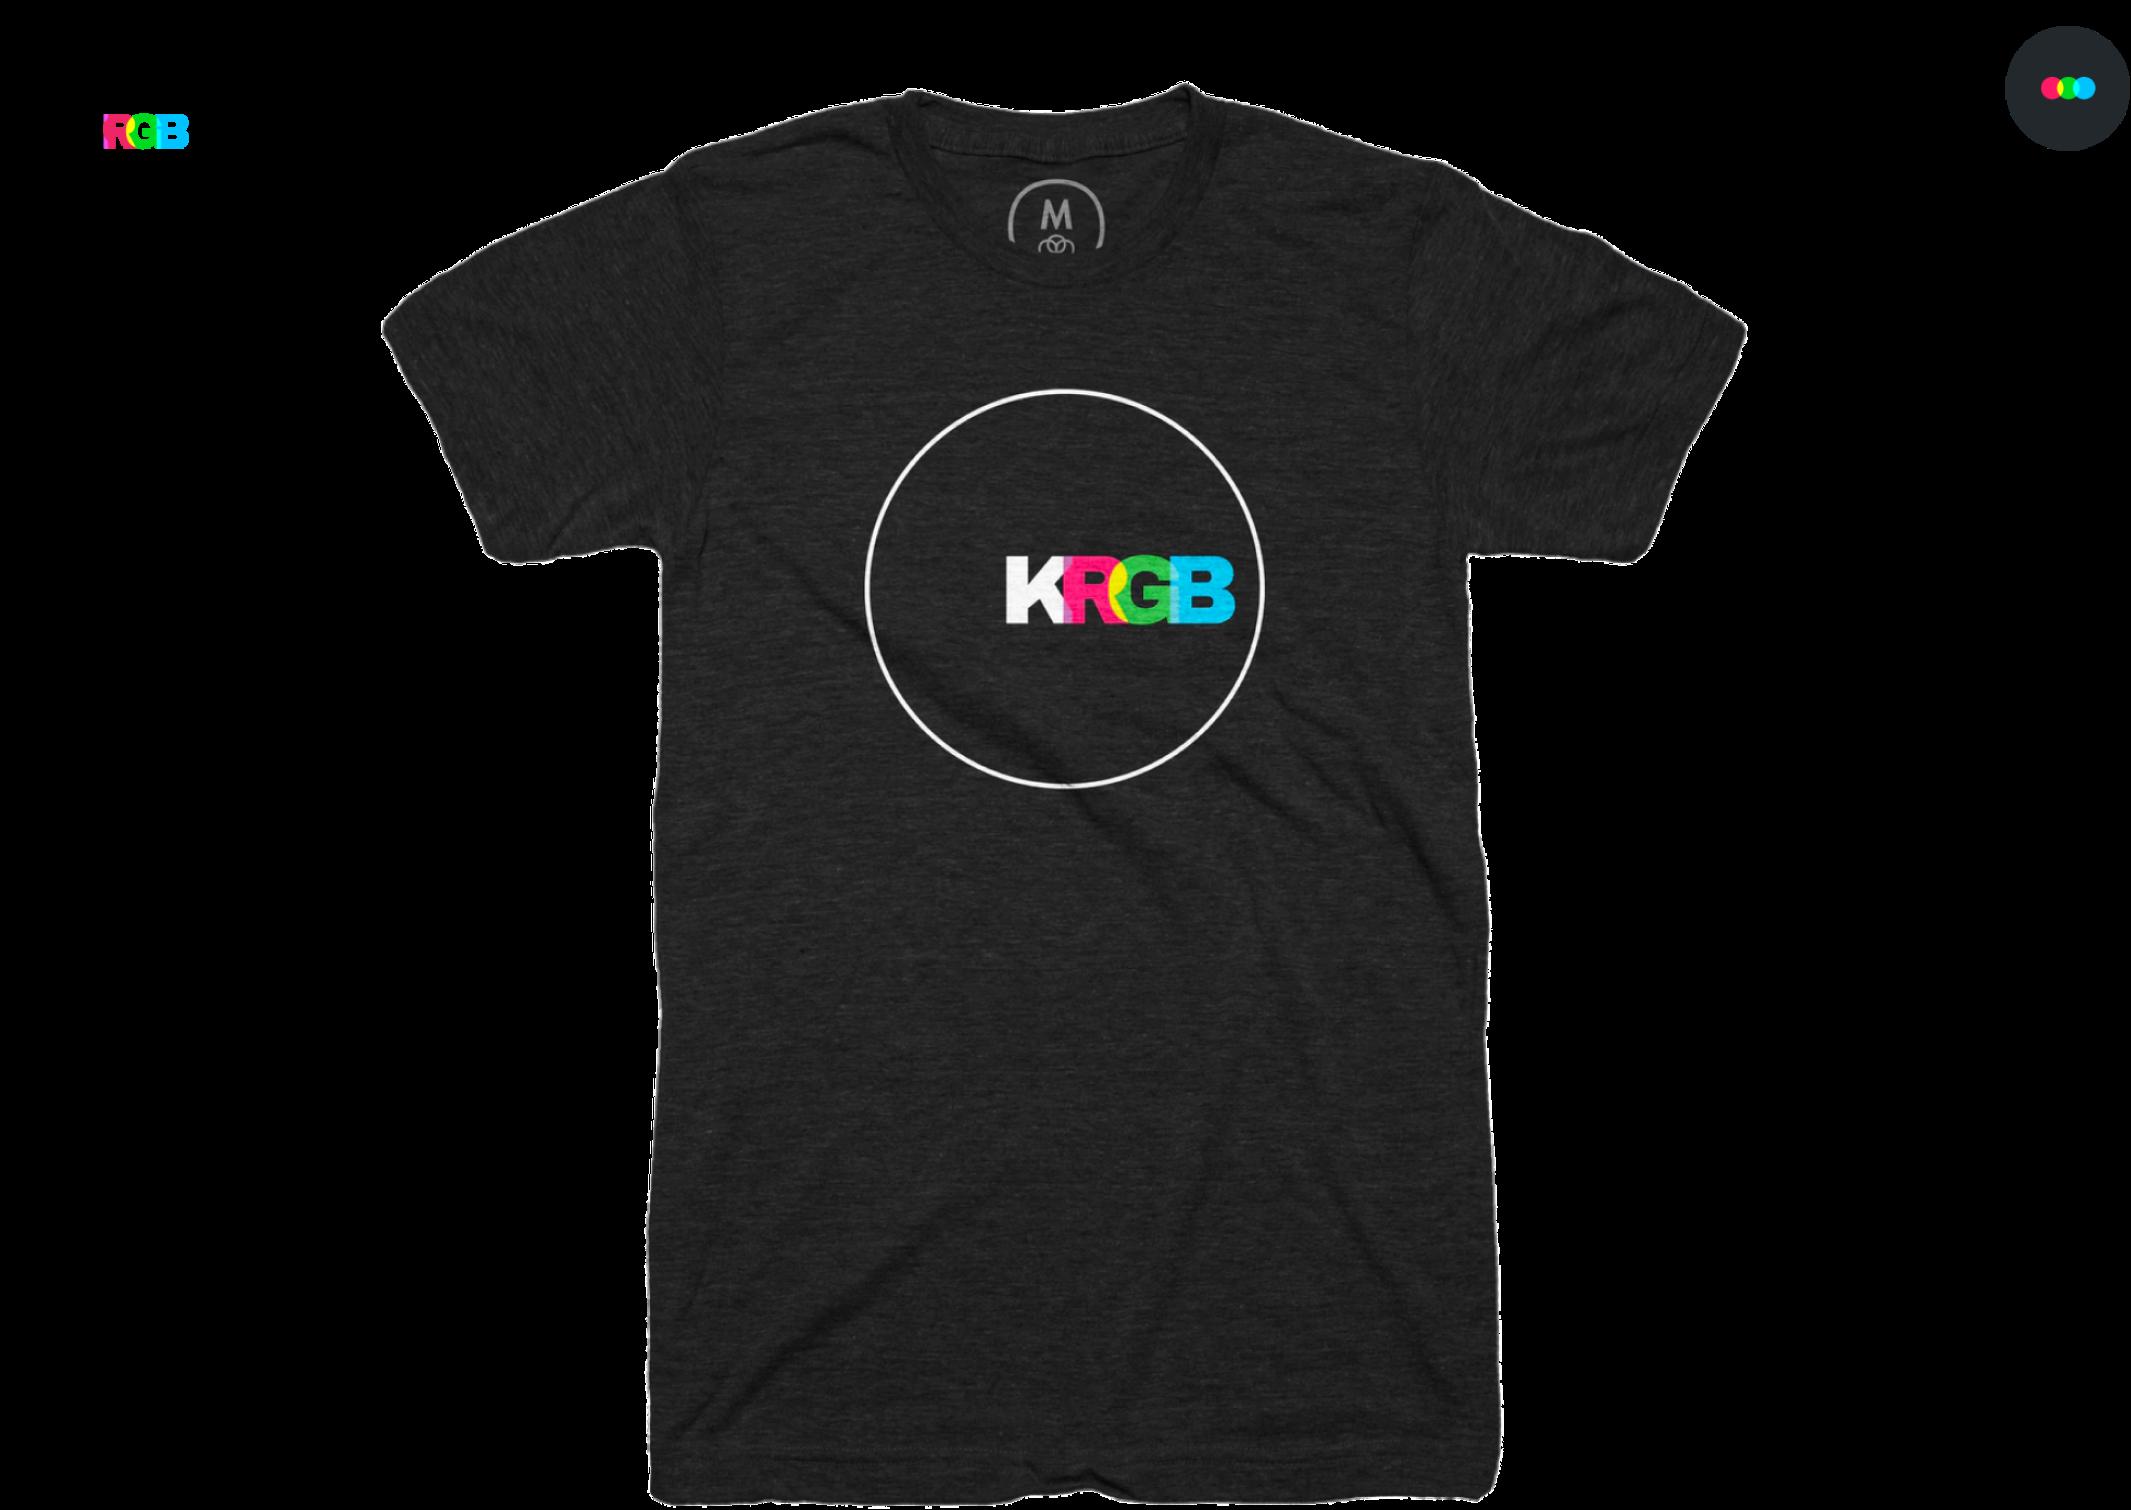 KRGB logo, t-shirt with KRGB logo on it, and KRGB avatar